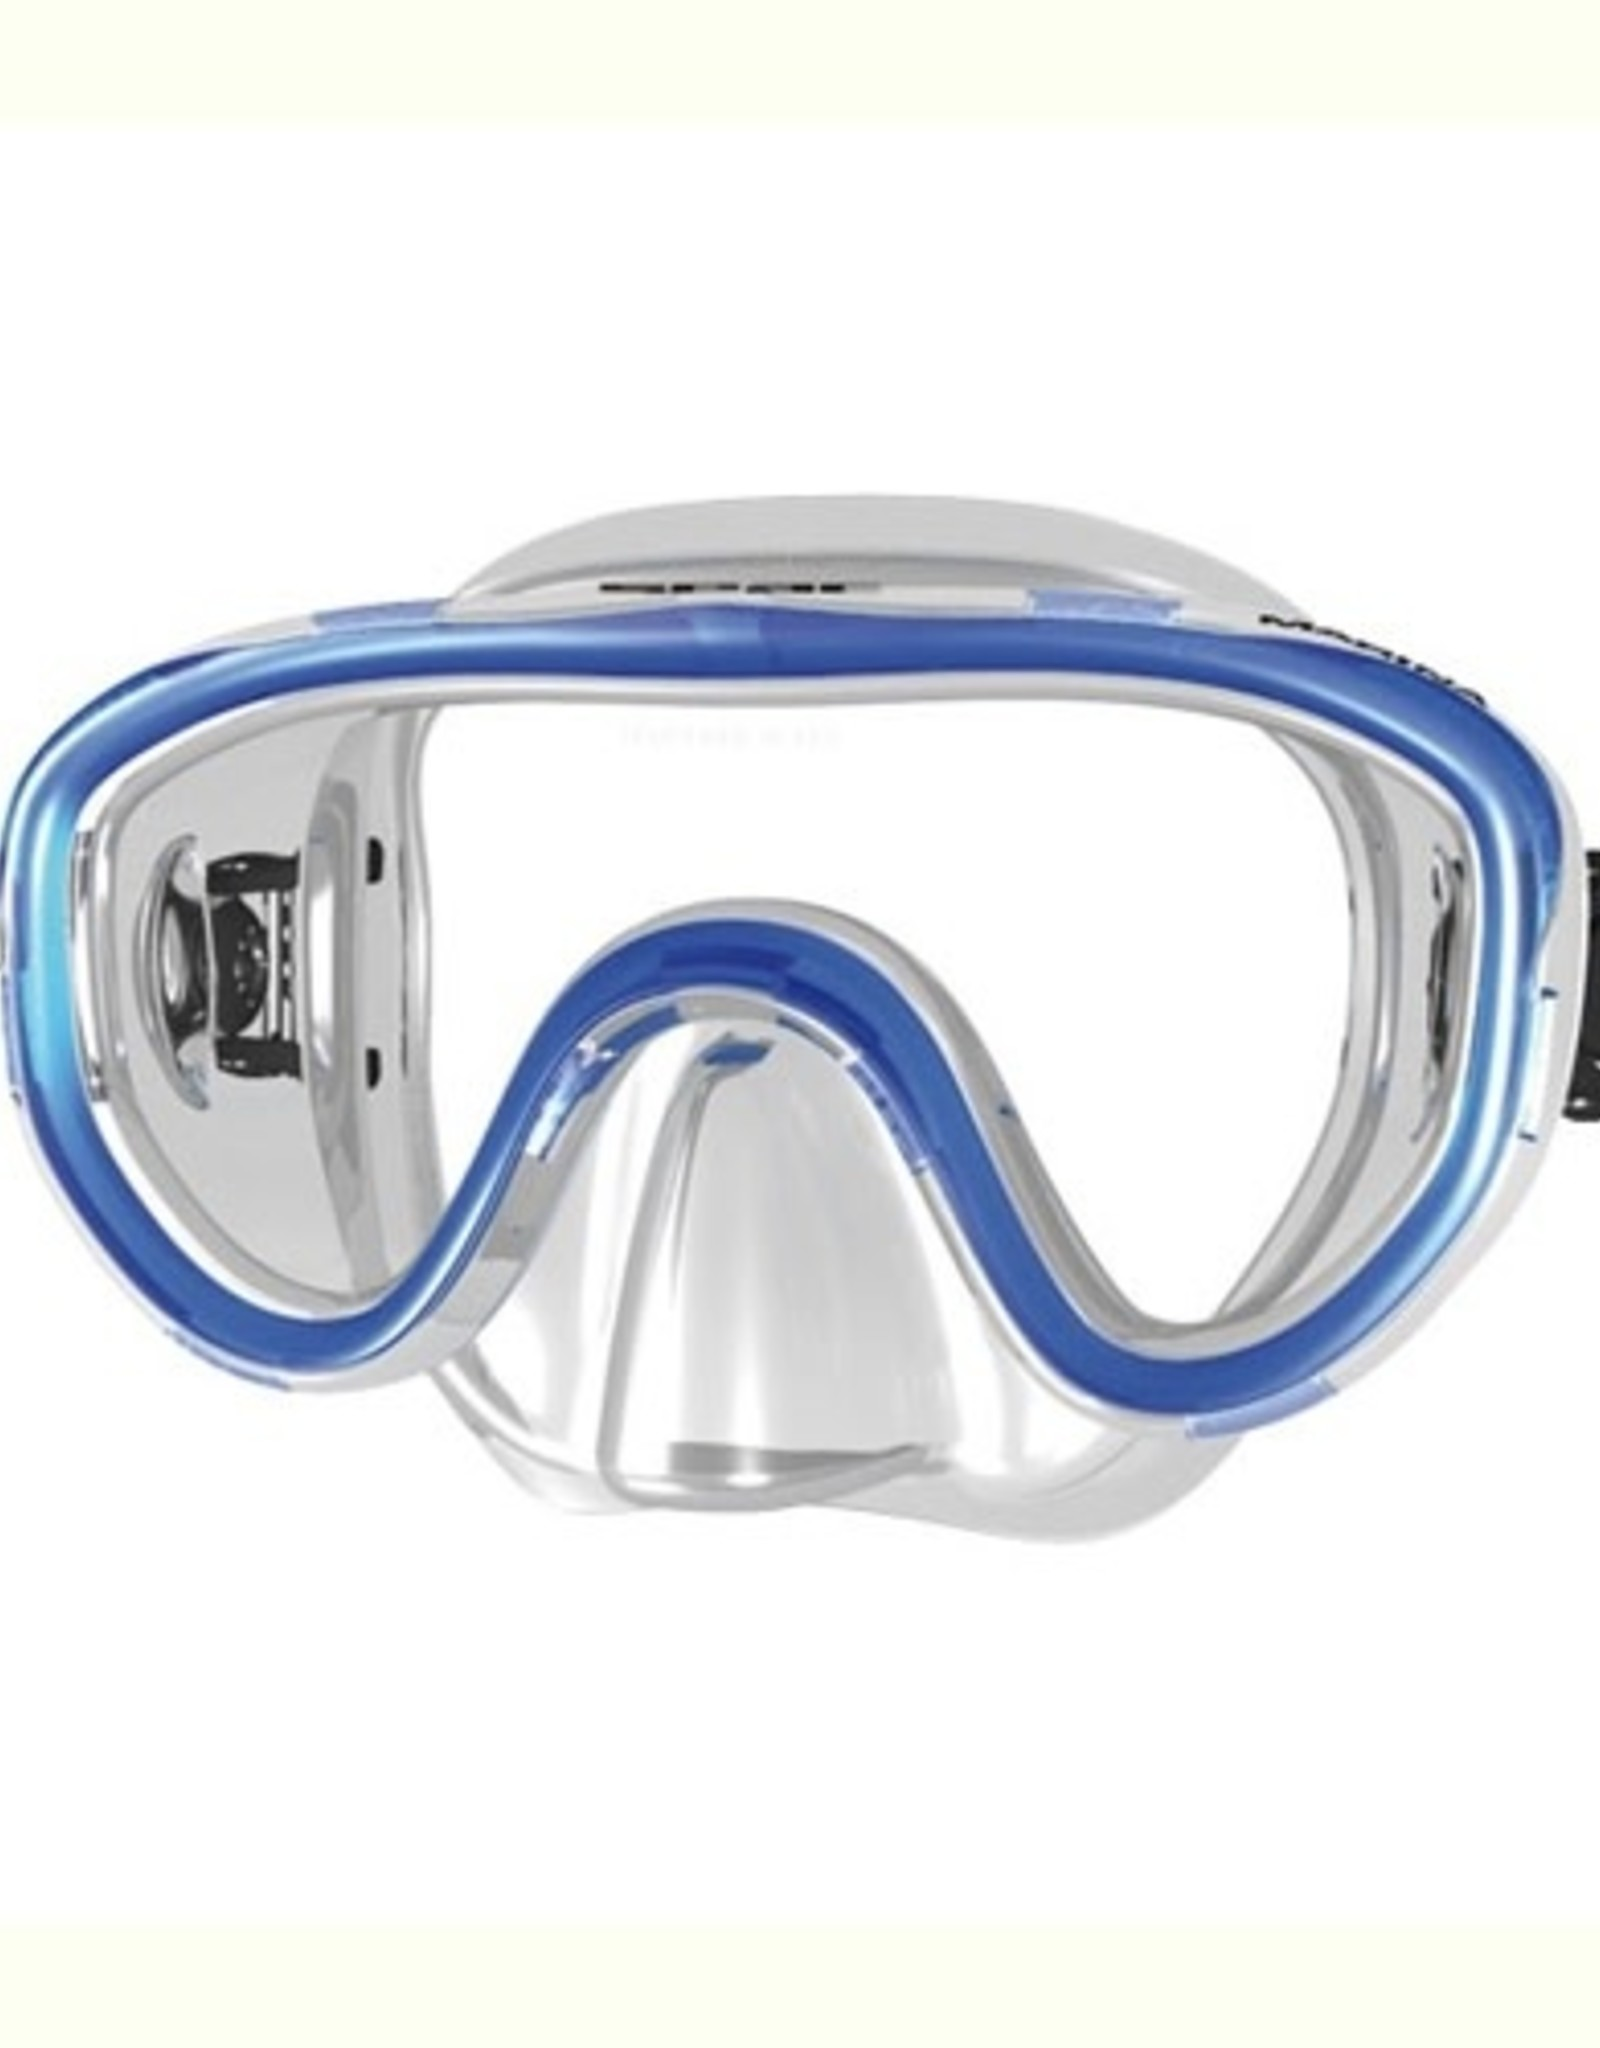 Seac Duikbril Marina 3-8 Jaar Blauw